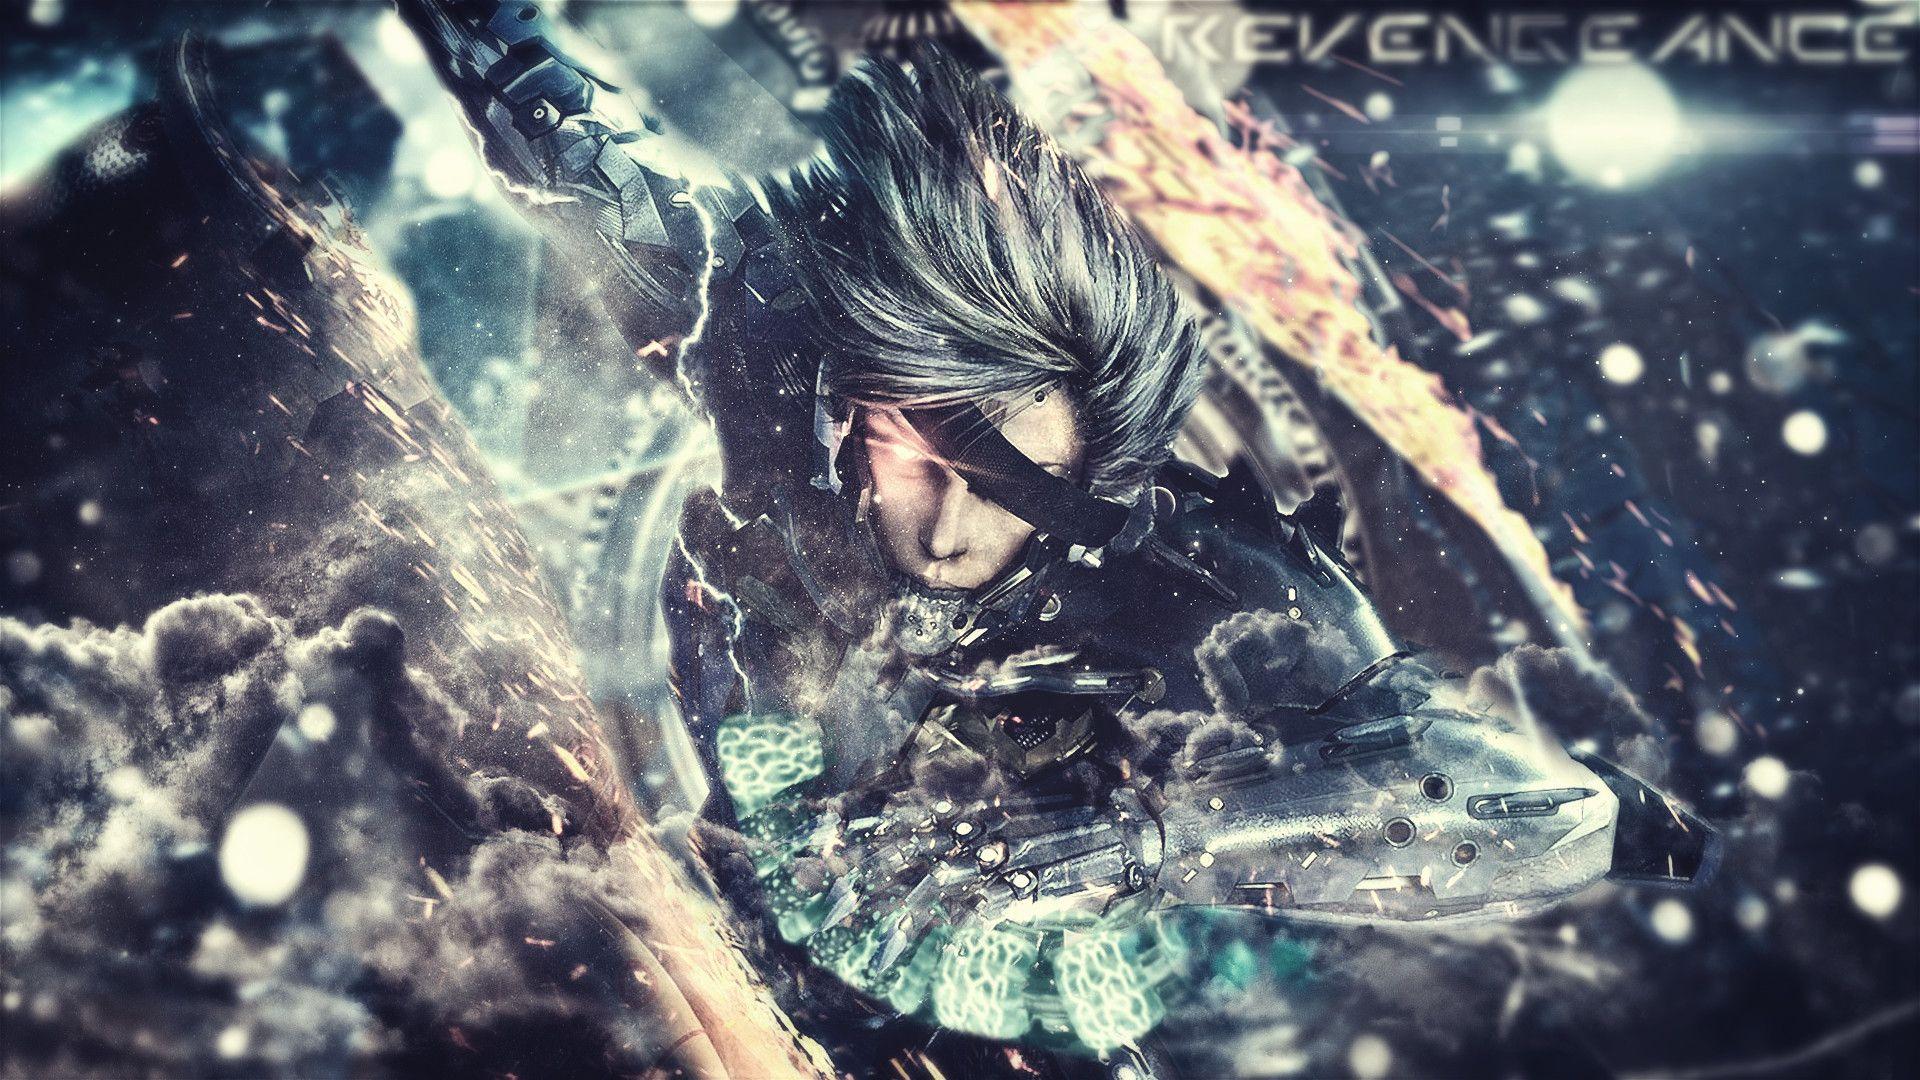 video game - metal gear rising: revengeance wallpaper | fascinating